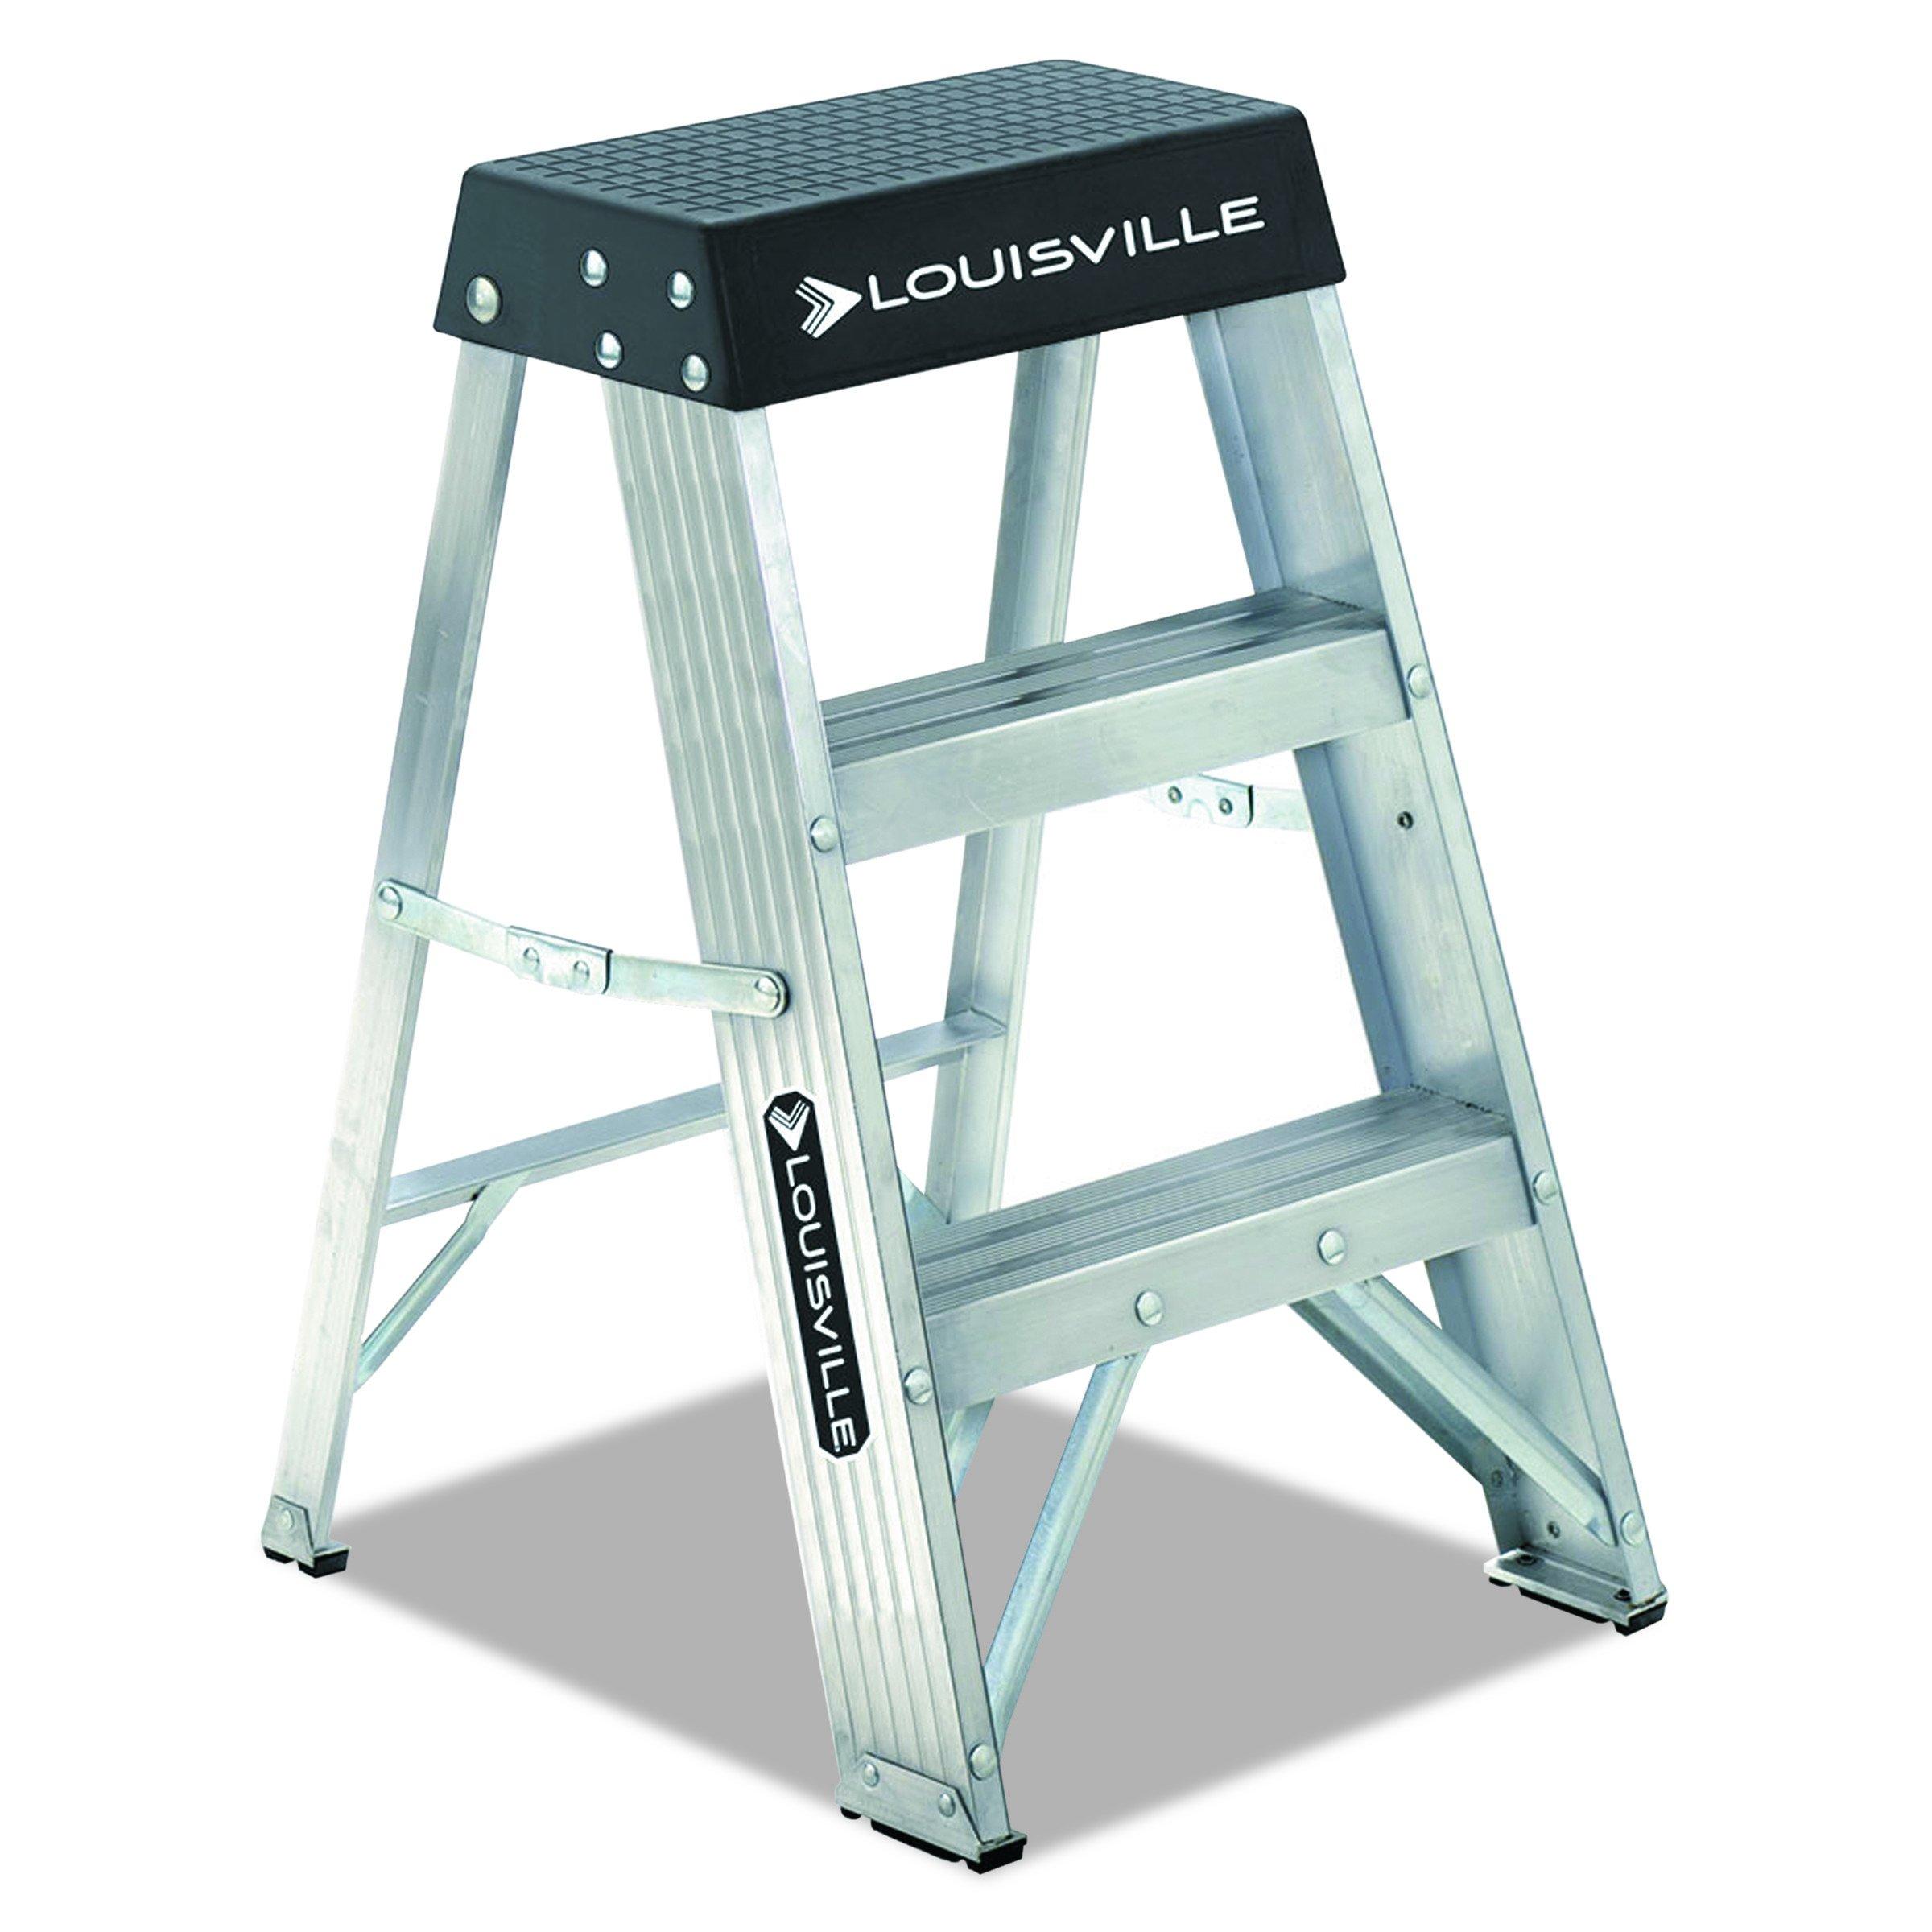 Louisville Ladder AS3002 6966014 2 Foot